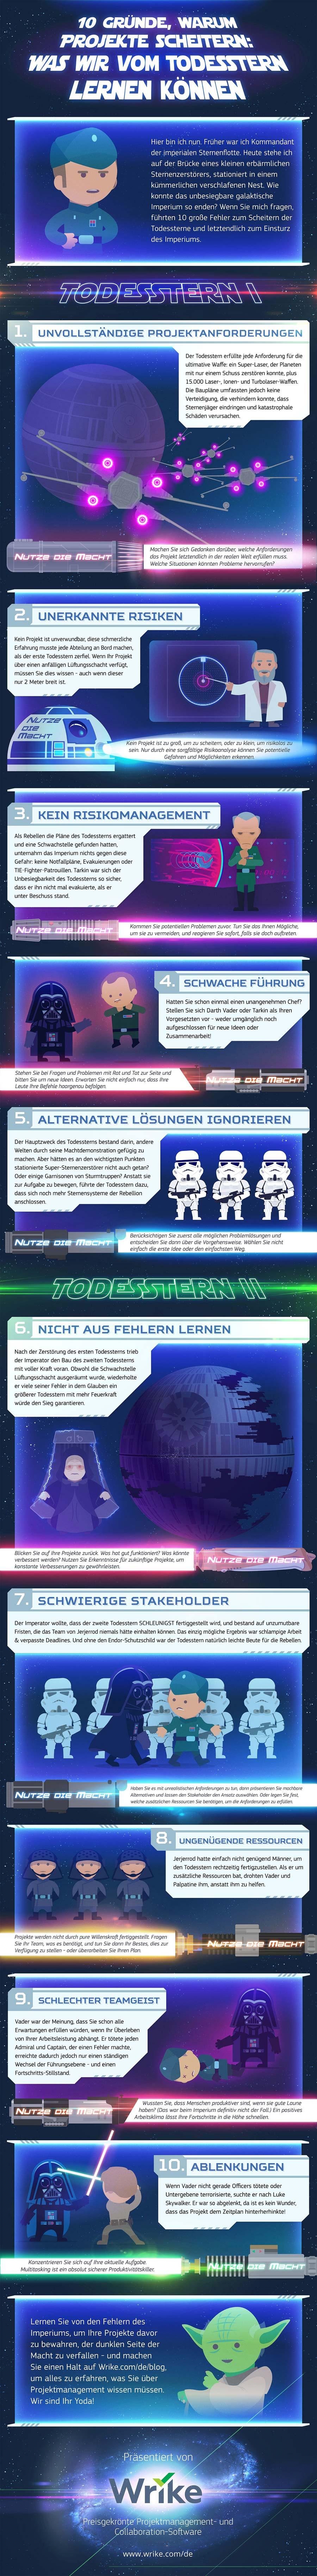 Infografik Projektmanagement Star Wars Todesstern (Bild: Wrike)